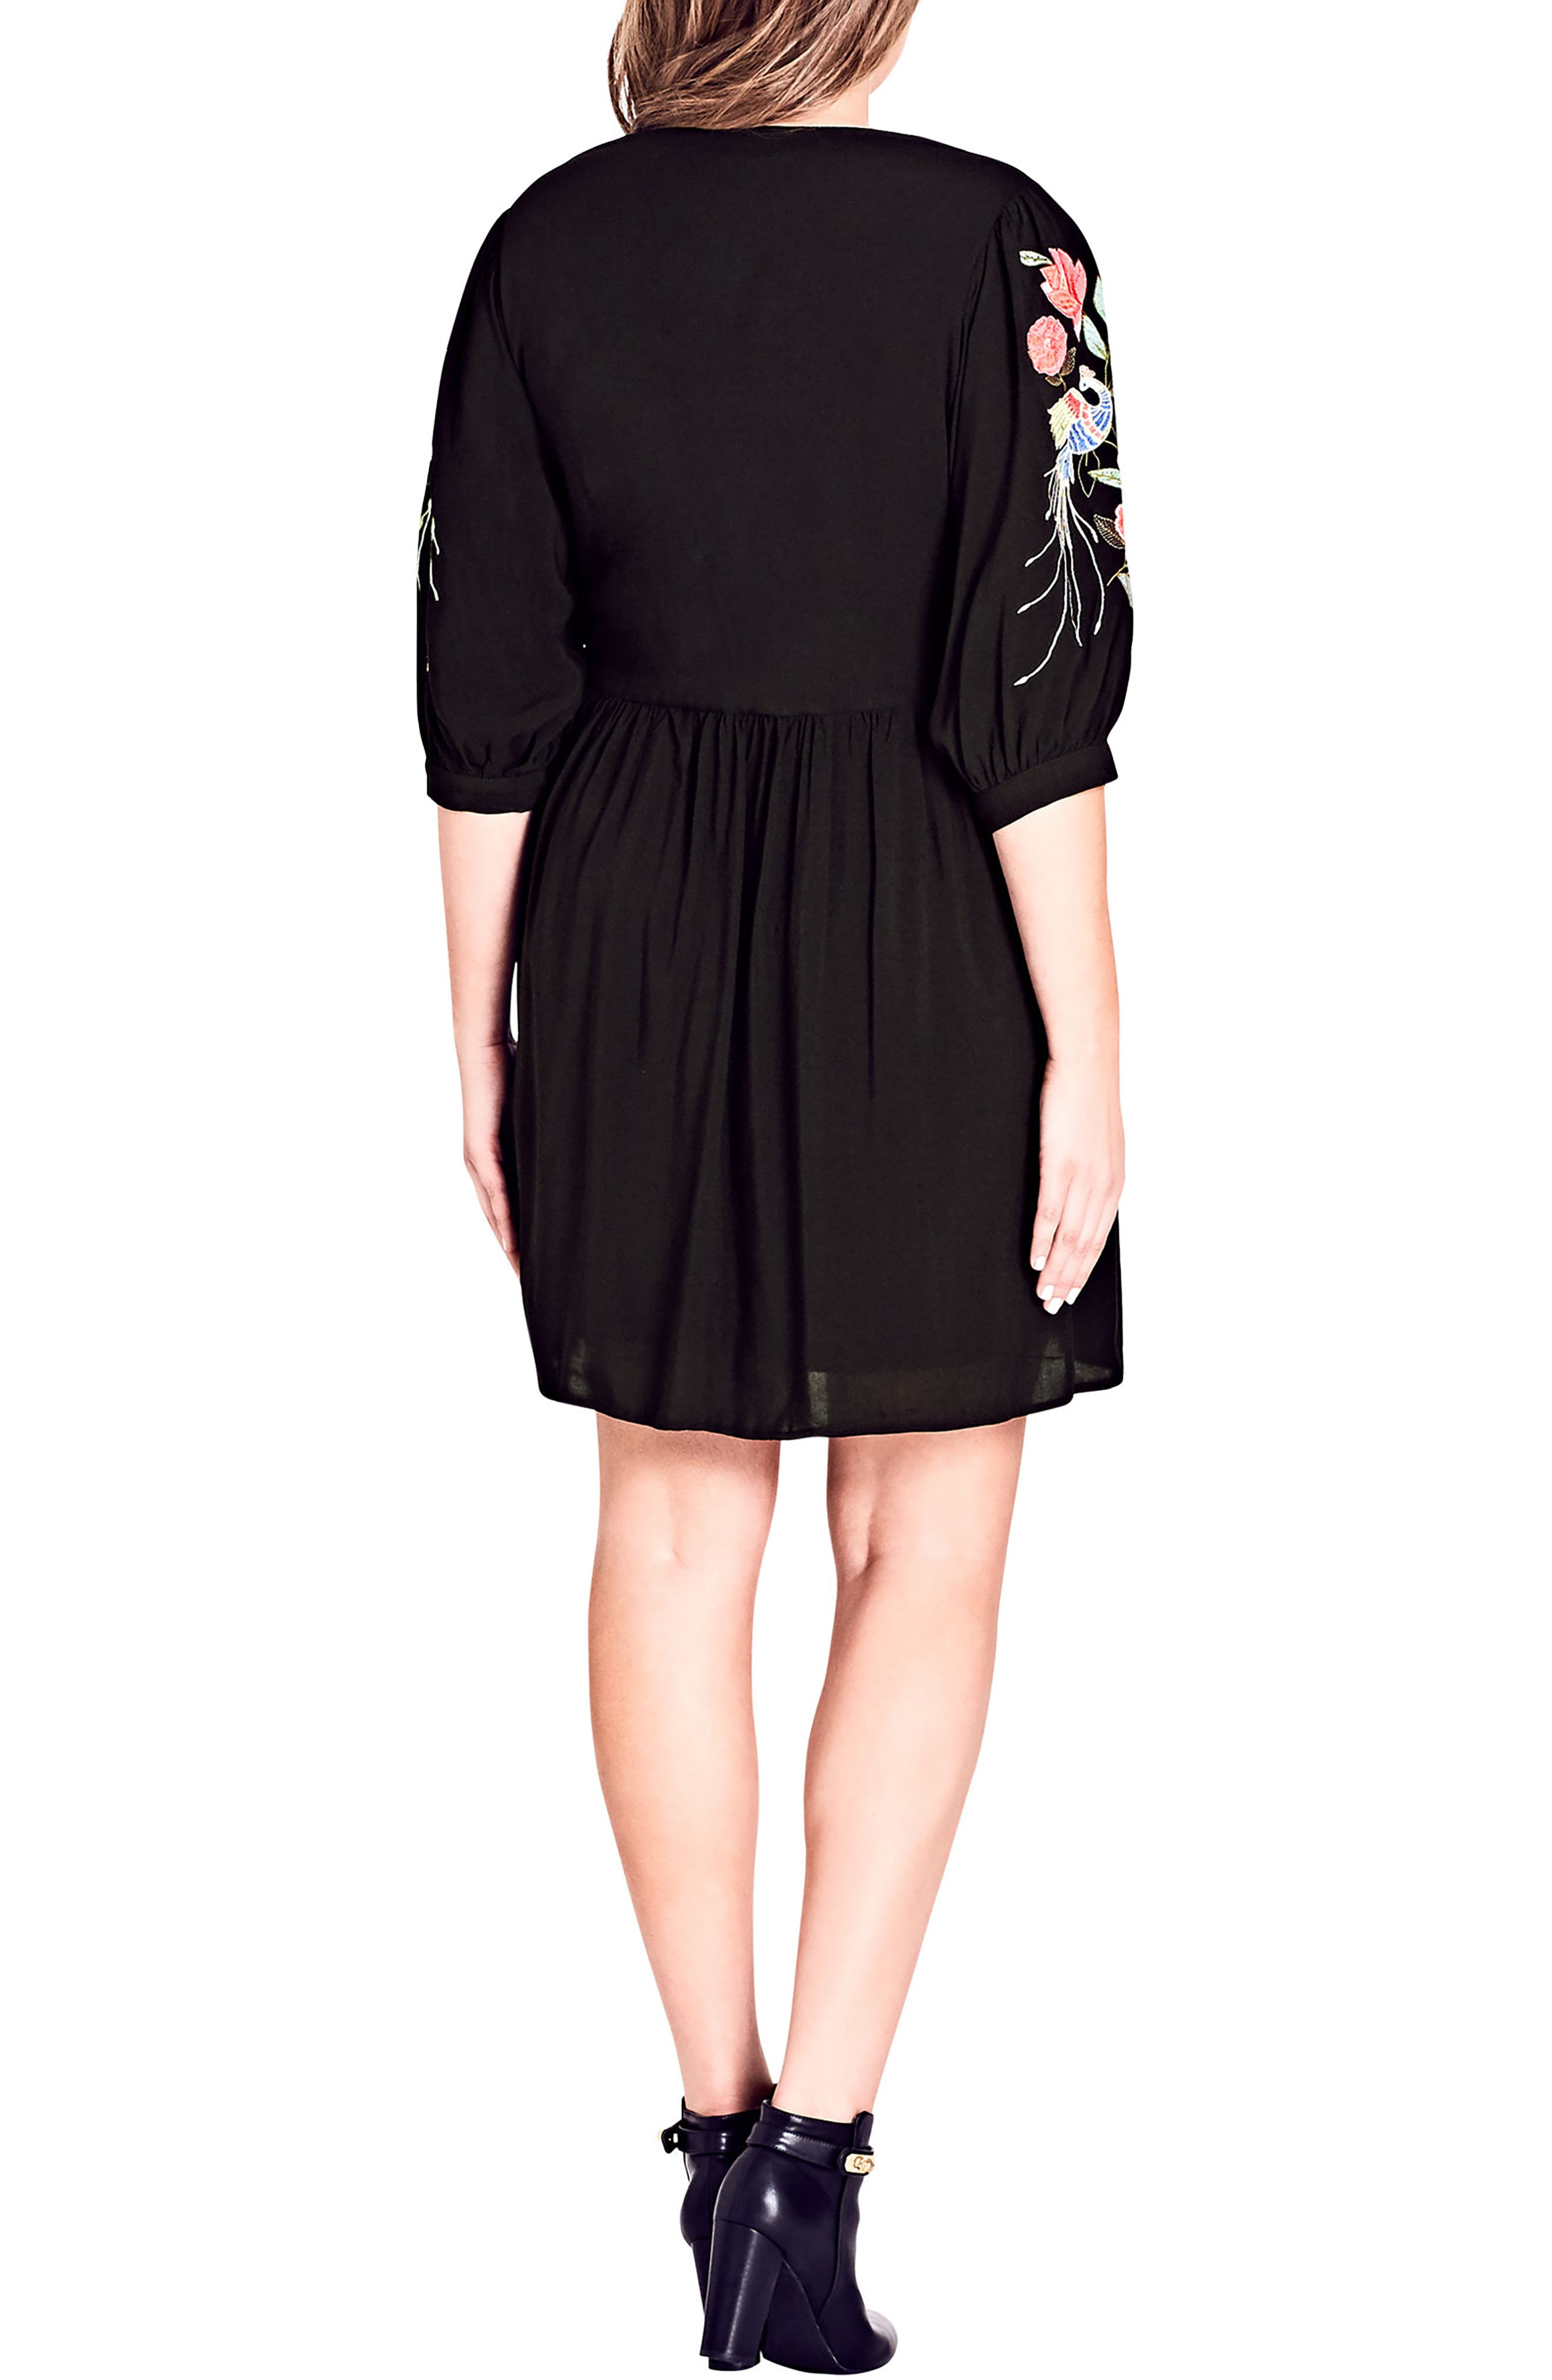 Phoenix Dress,                             Alternate thumbnail 2, color,                             Black